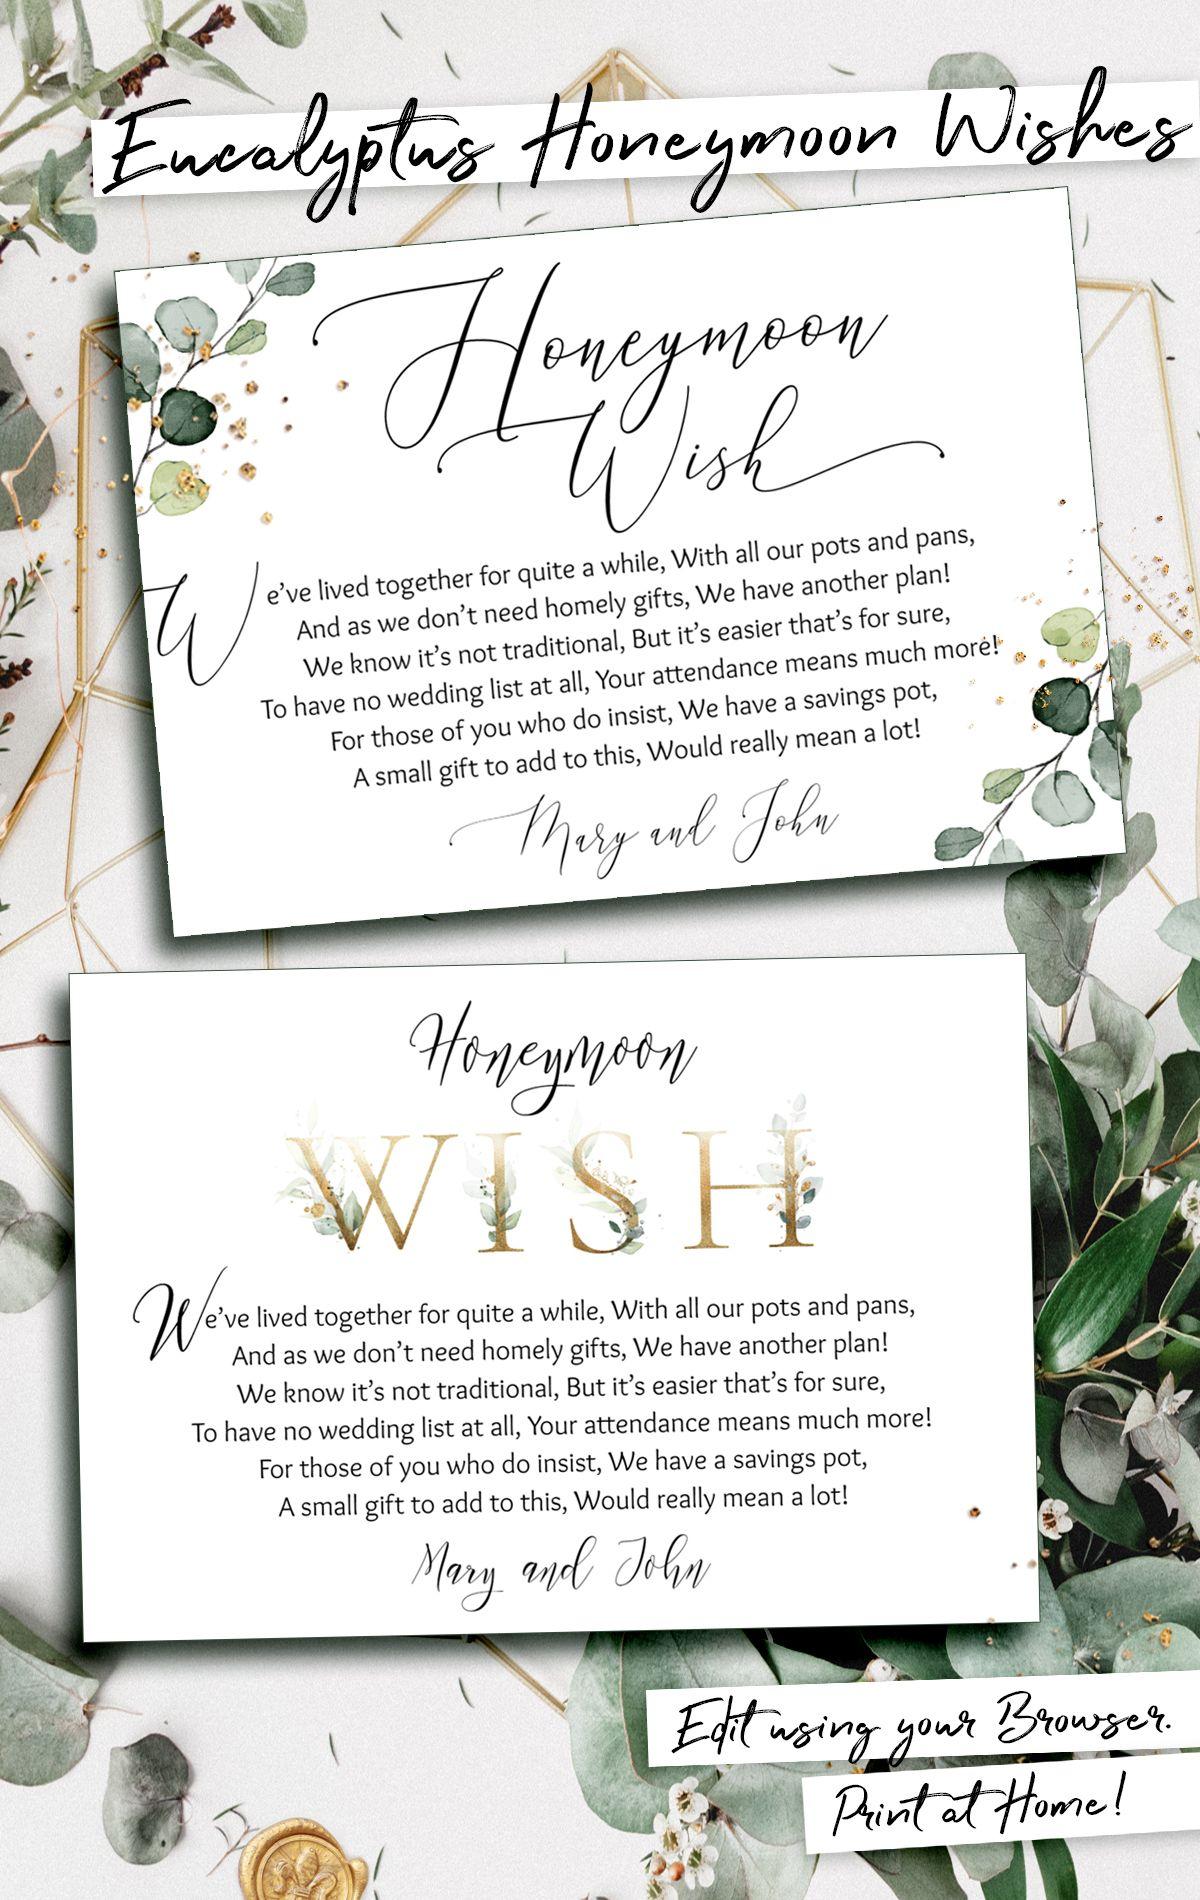 Honeymoon Fund Template Wishing Well Card Instant Download Editable Text Printable Honeymoon Wish Card In Lieu Of Gifts Handmade Diy Diy Wedding Invitations Templates Wedding Invitation Templates Wedding Invitations Diy